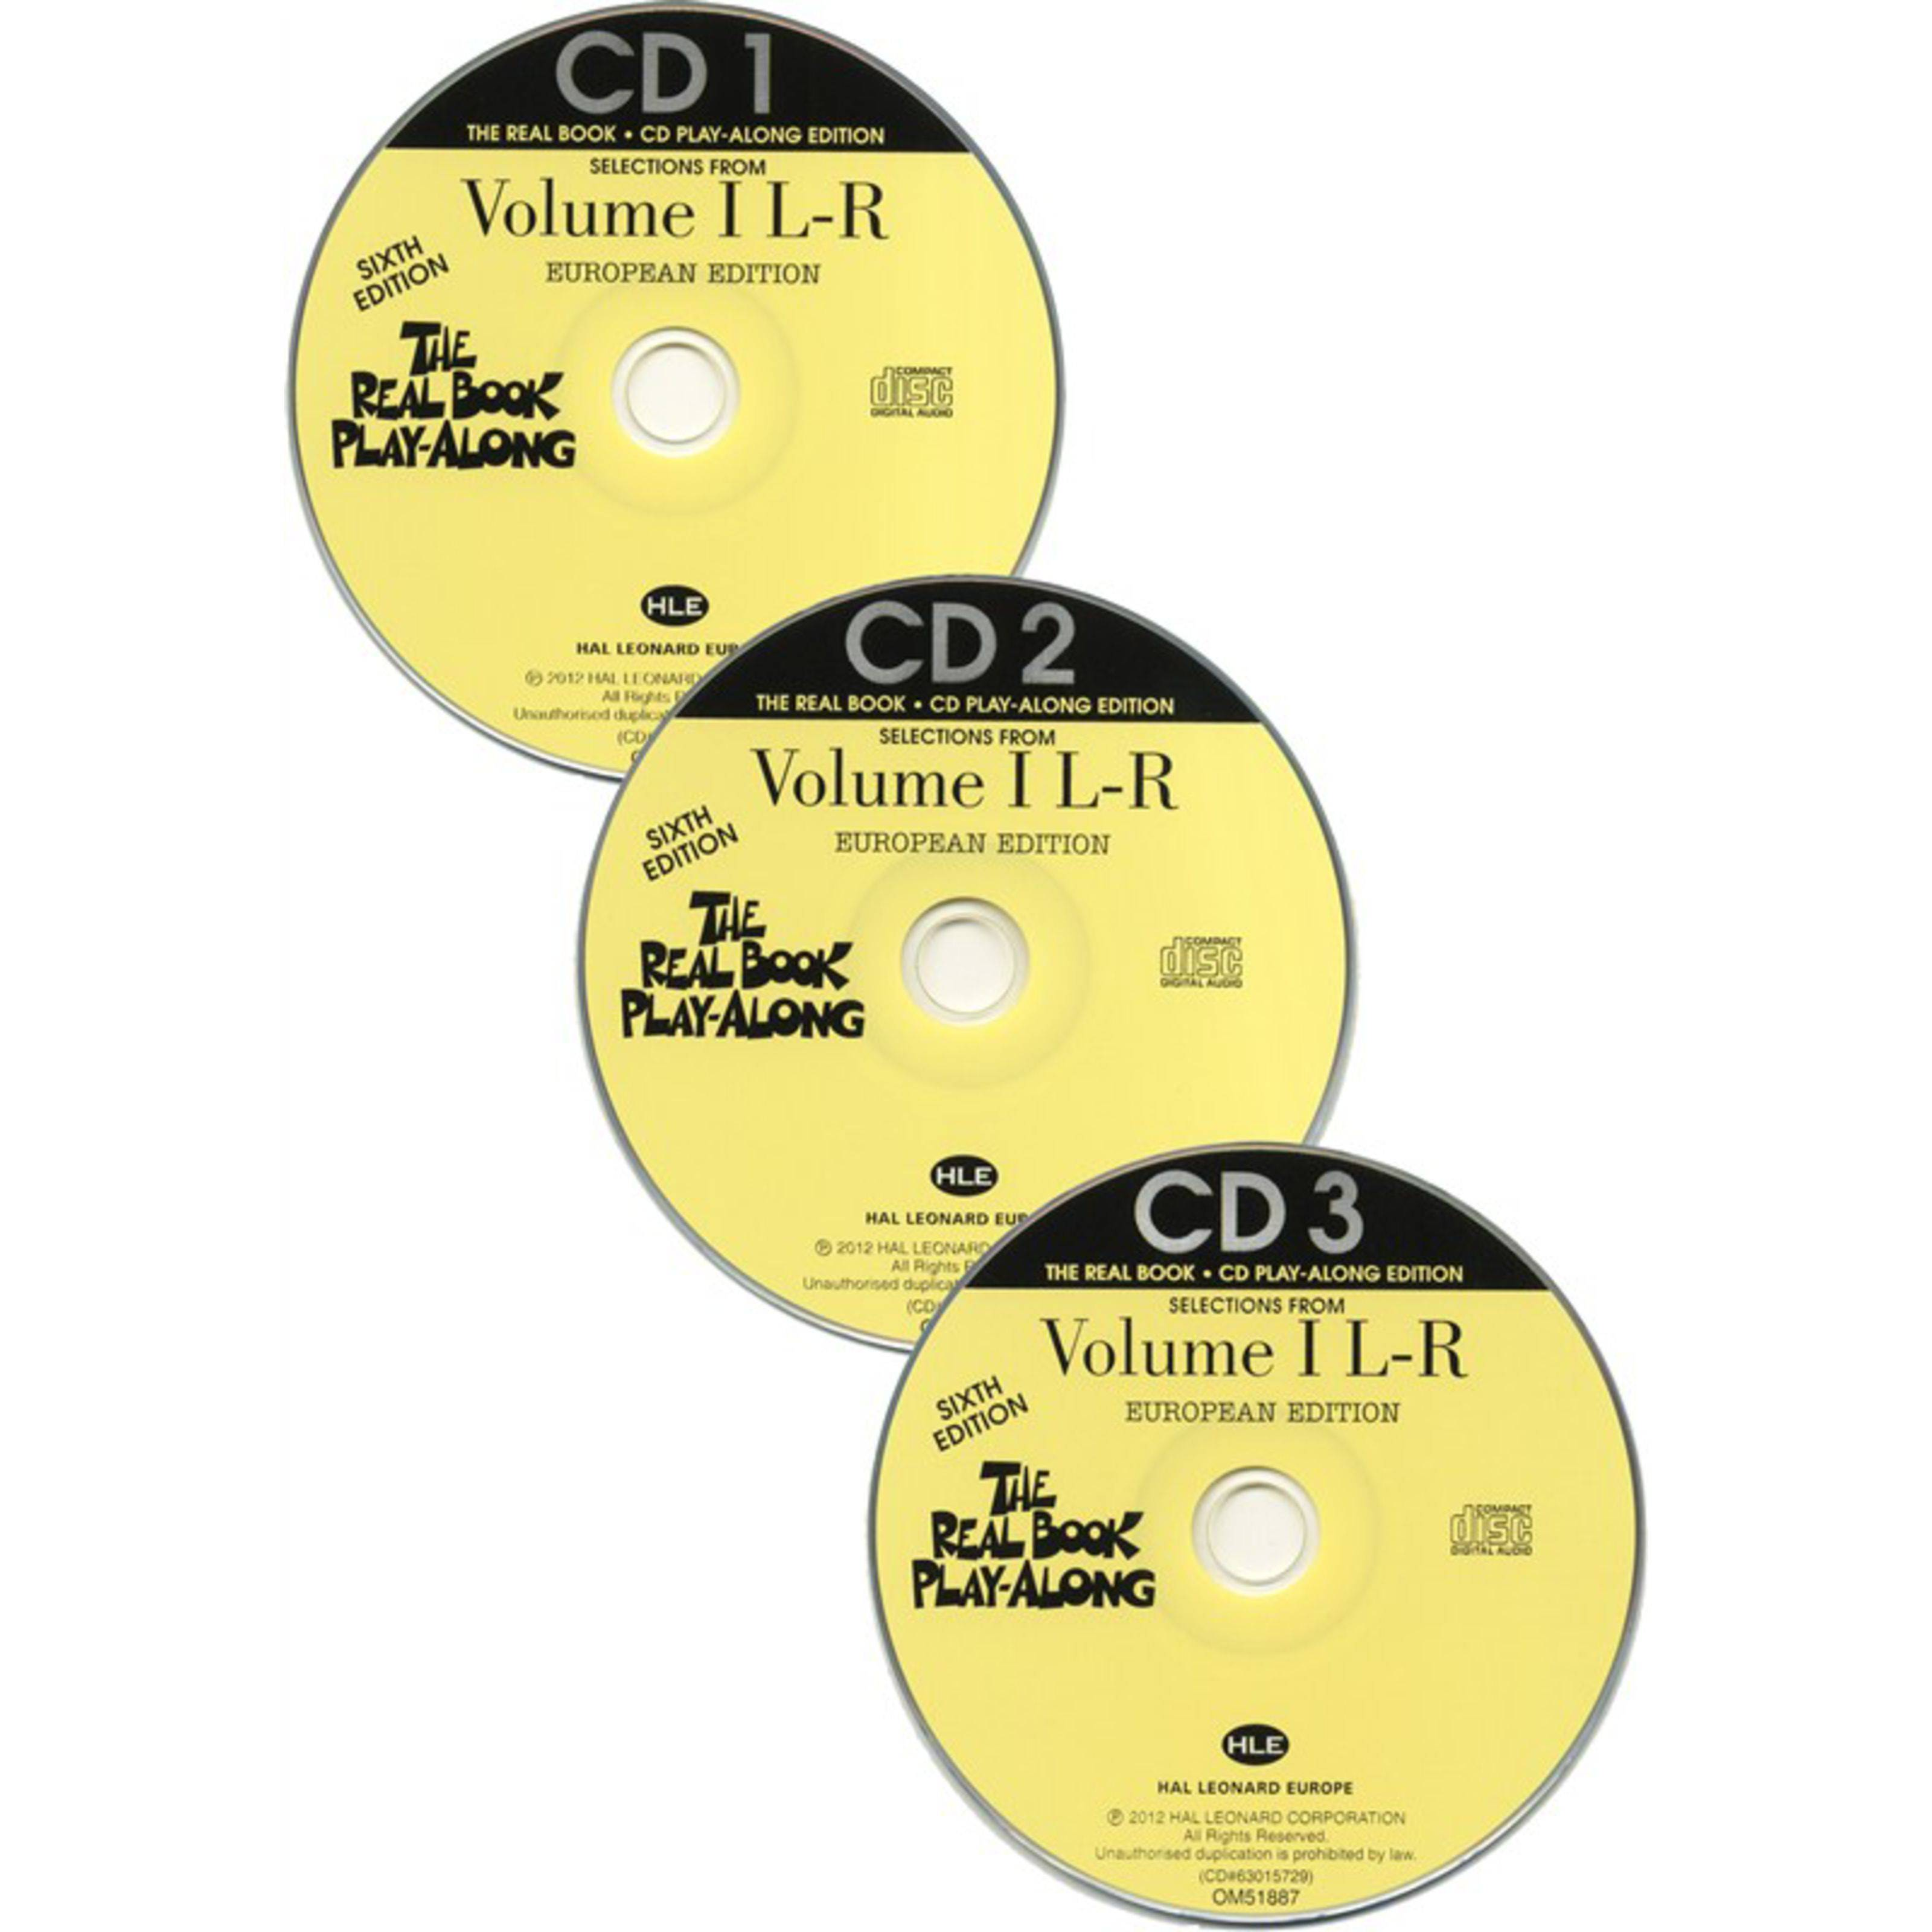 Hal Leonard The Real Book Playalong L-R Sixth Edition - Vol.1, 3 CDs